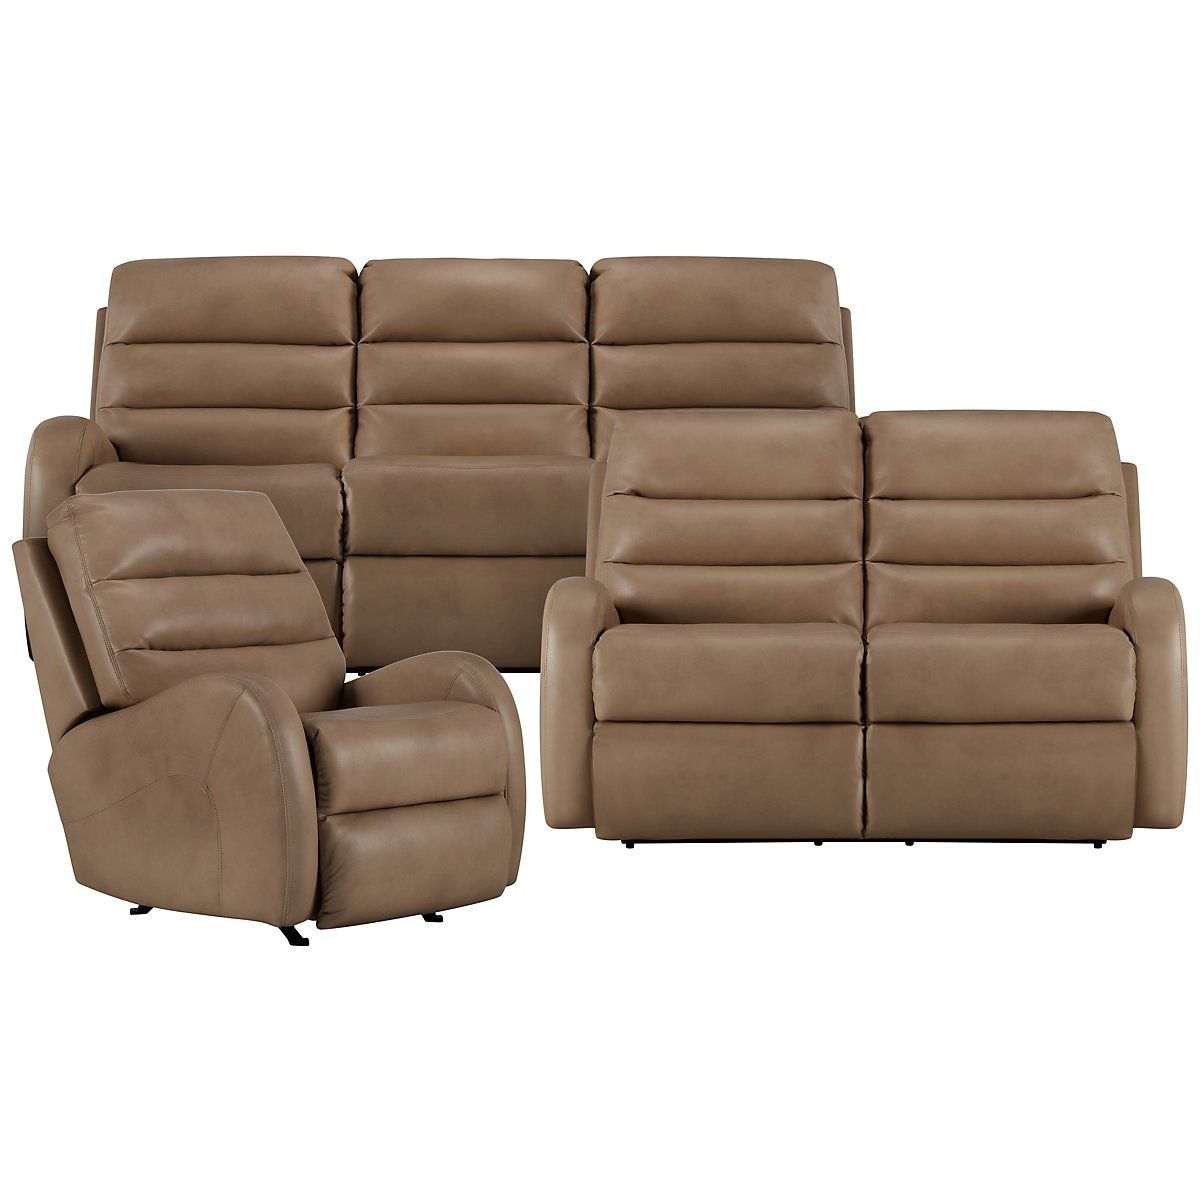 Carver beige microfiber power reclining living room city